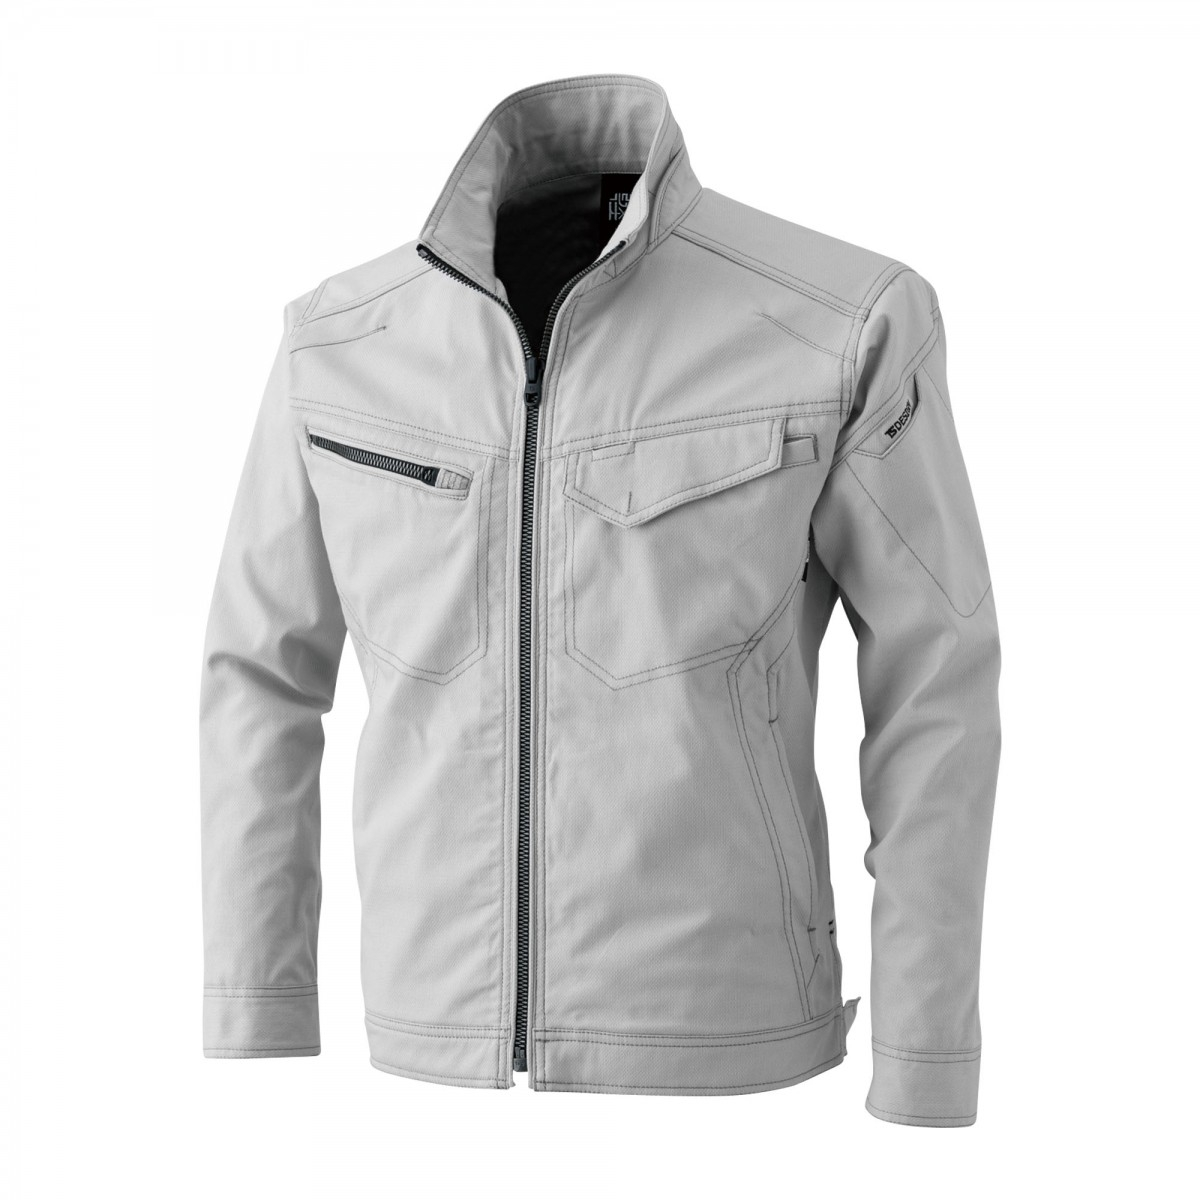 TS DESIGN 3516 ジャケット ¥5,280(税込)25 シルバーグレー